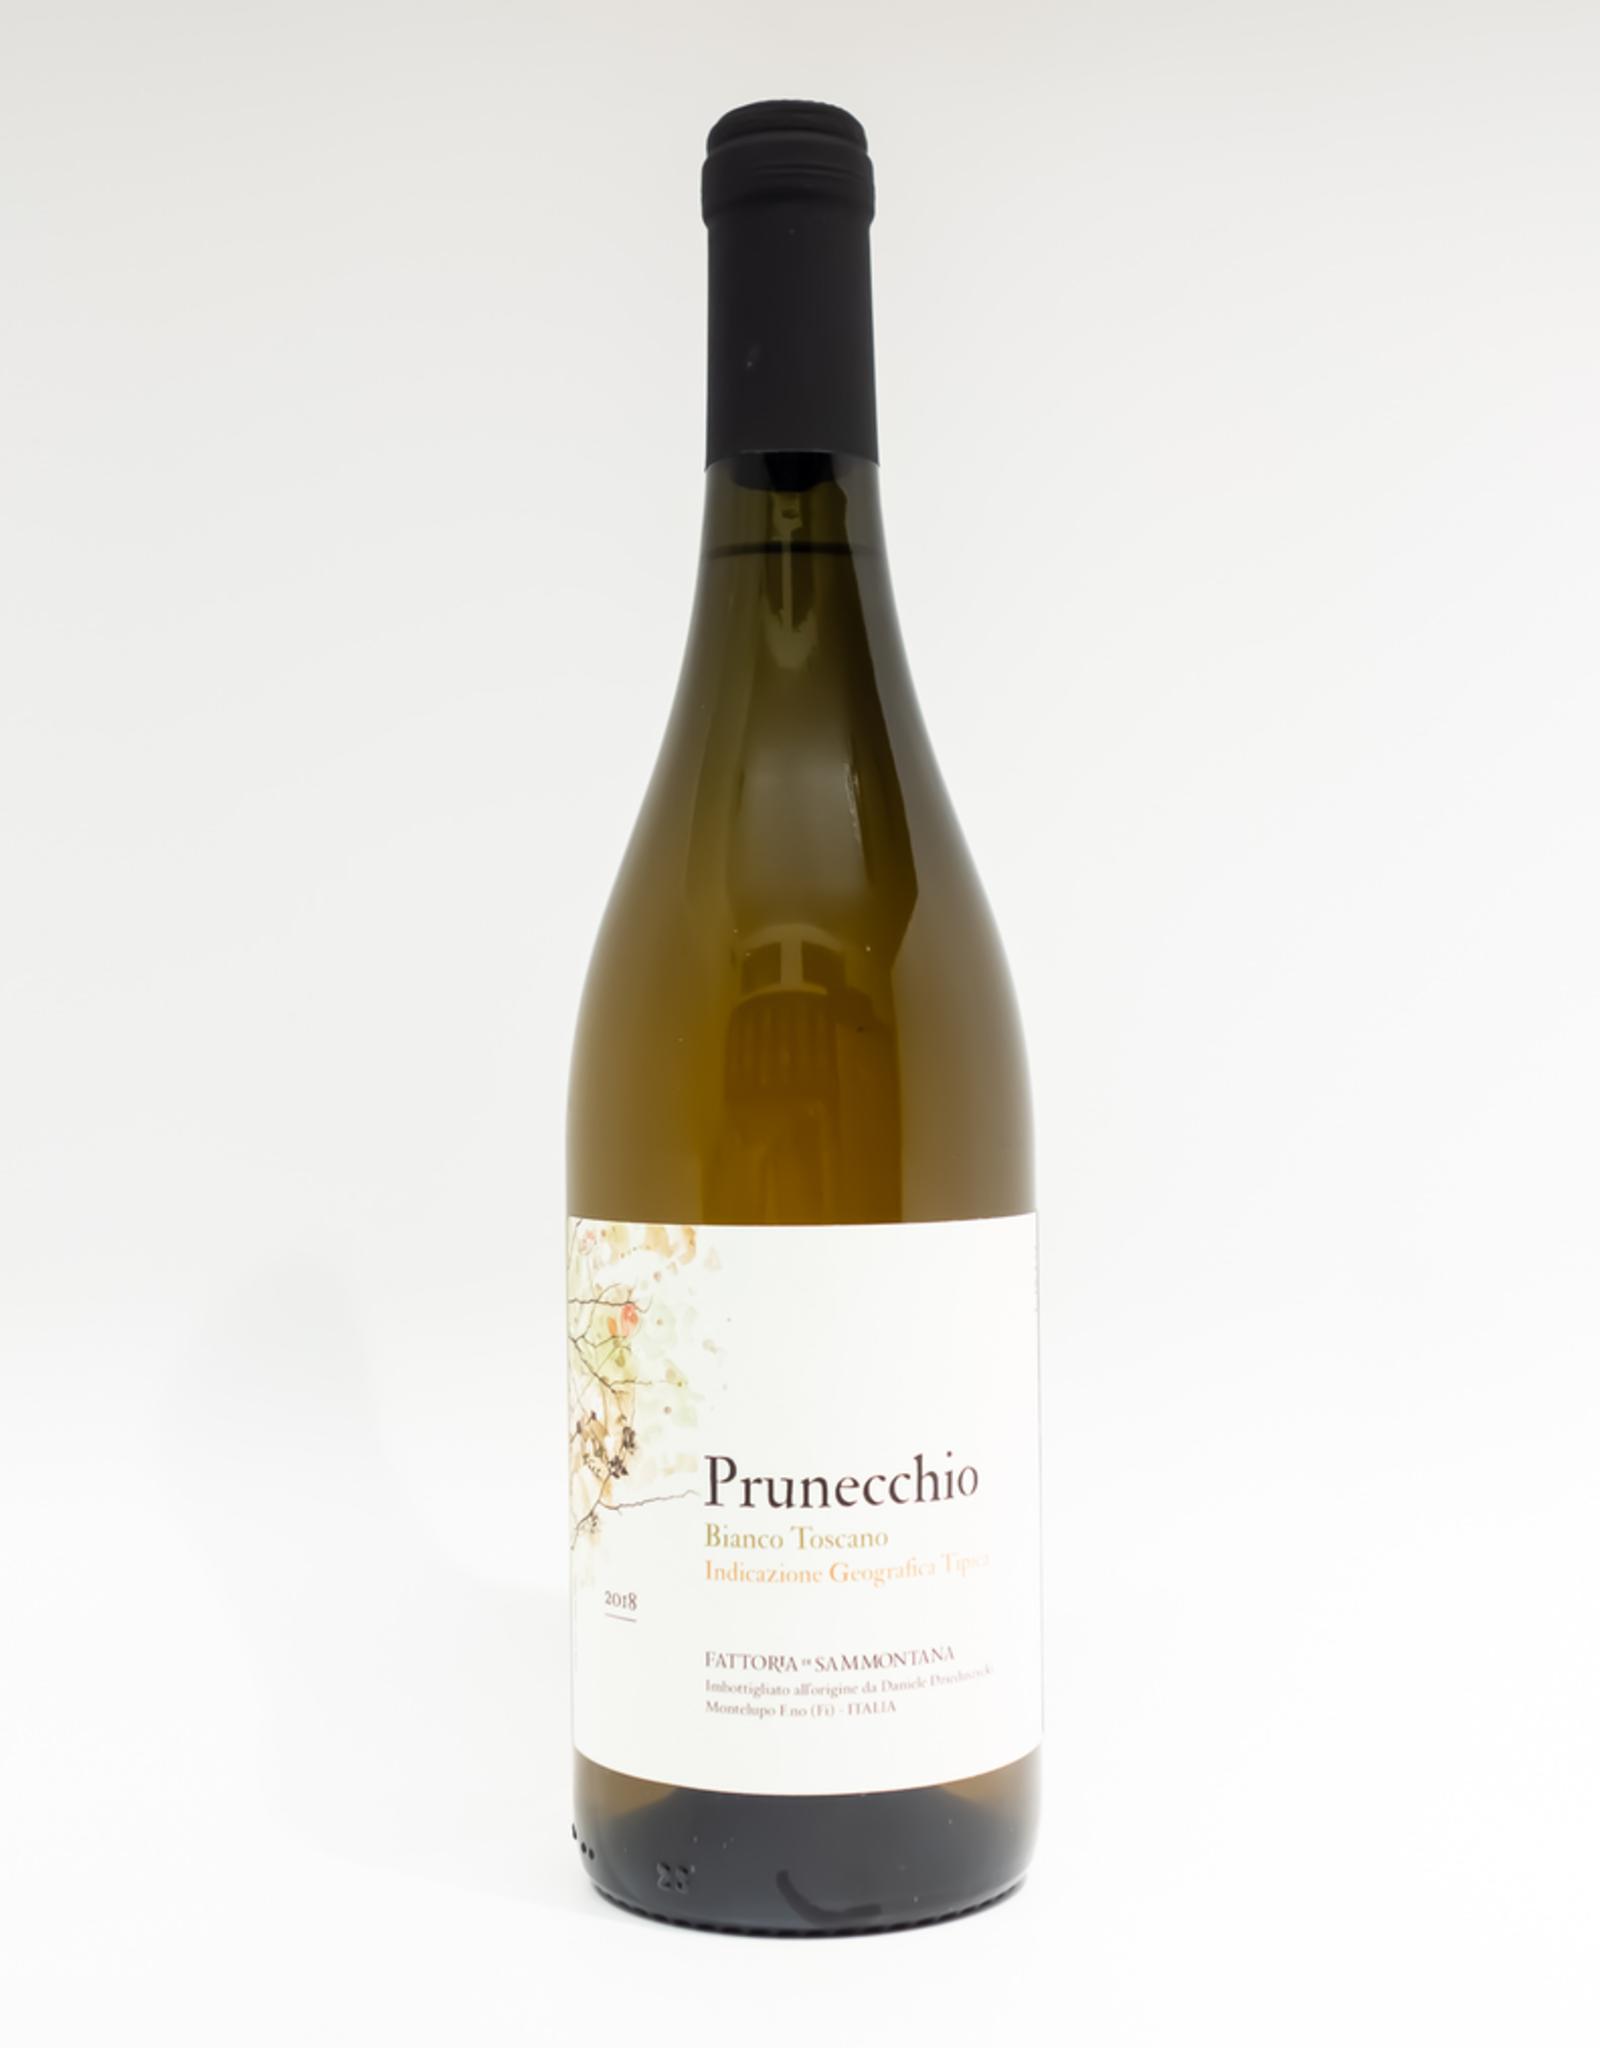 Wine-White-Crisp Fattoria di Sammontana 'Prunecchio' Bianco Toscano IGT 2018